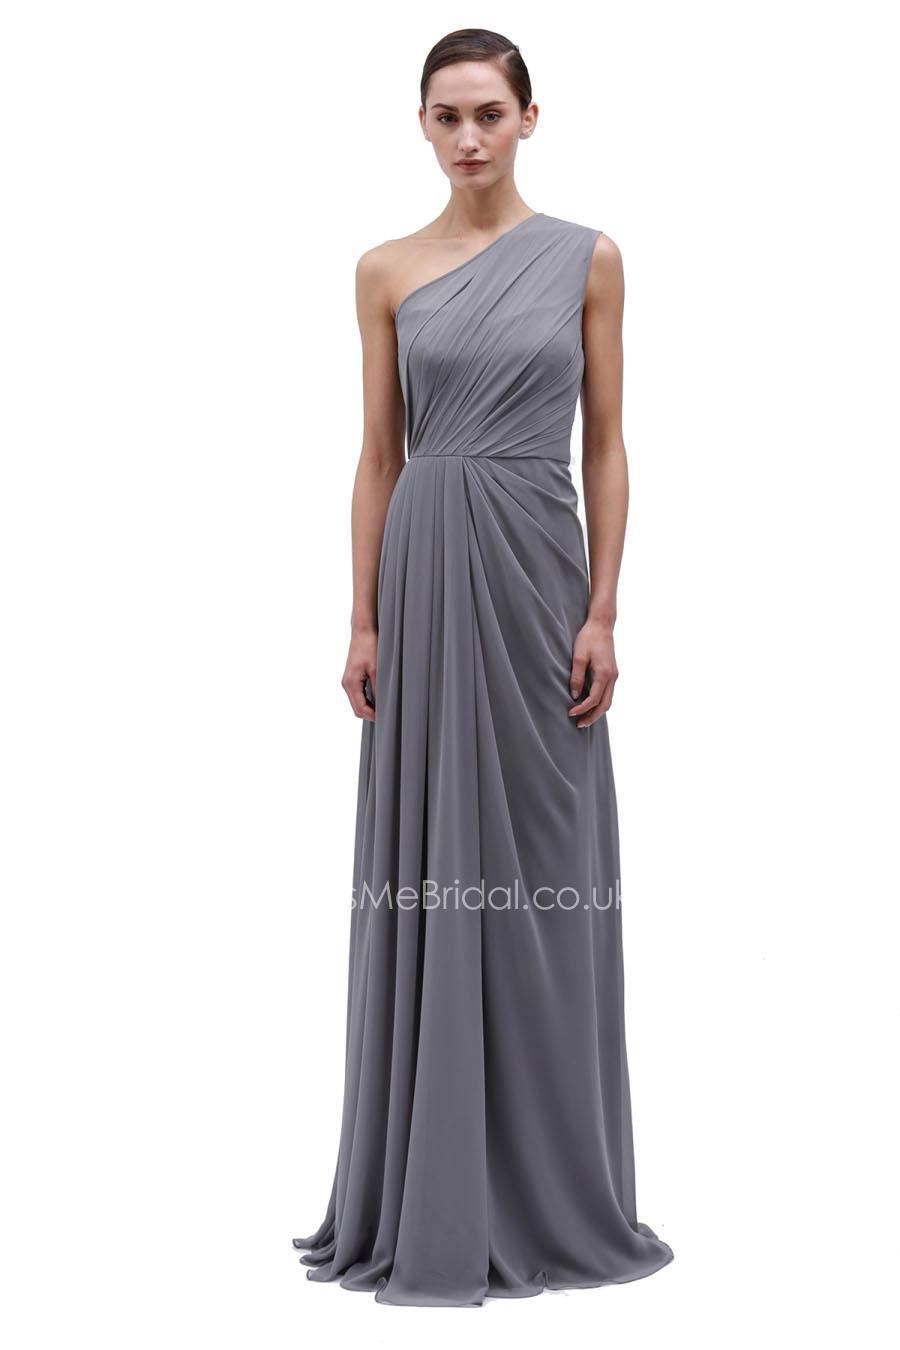 Shoulder one Grey bridesmaid dress pictures